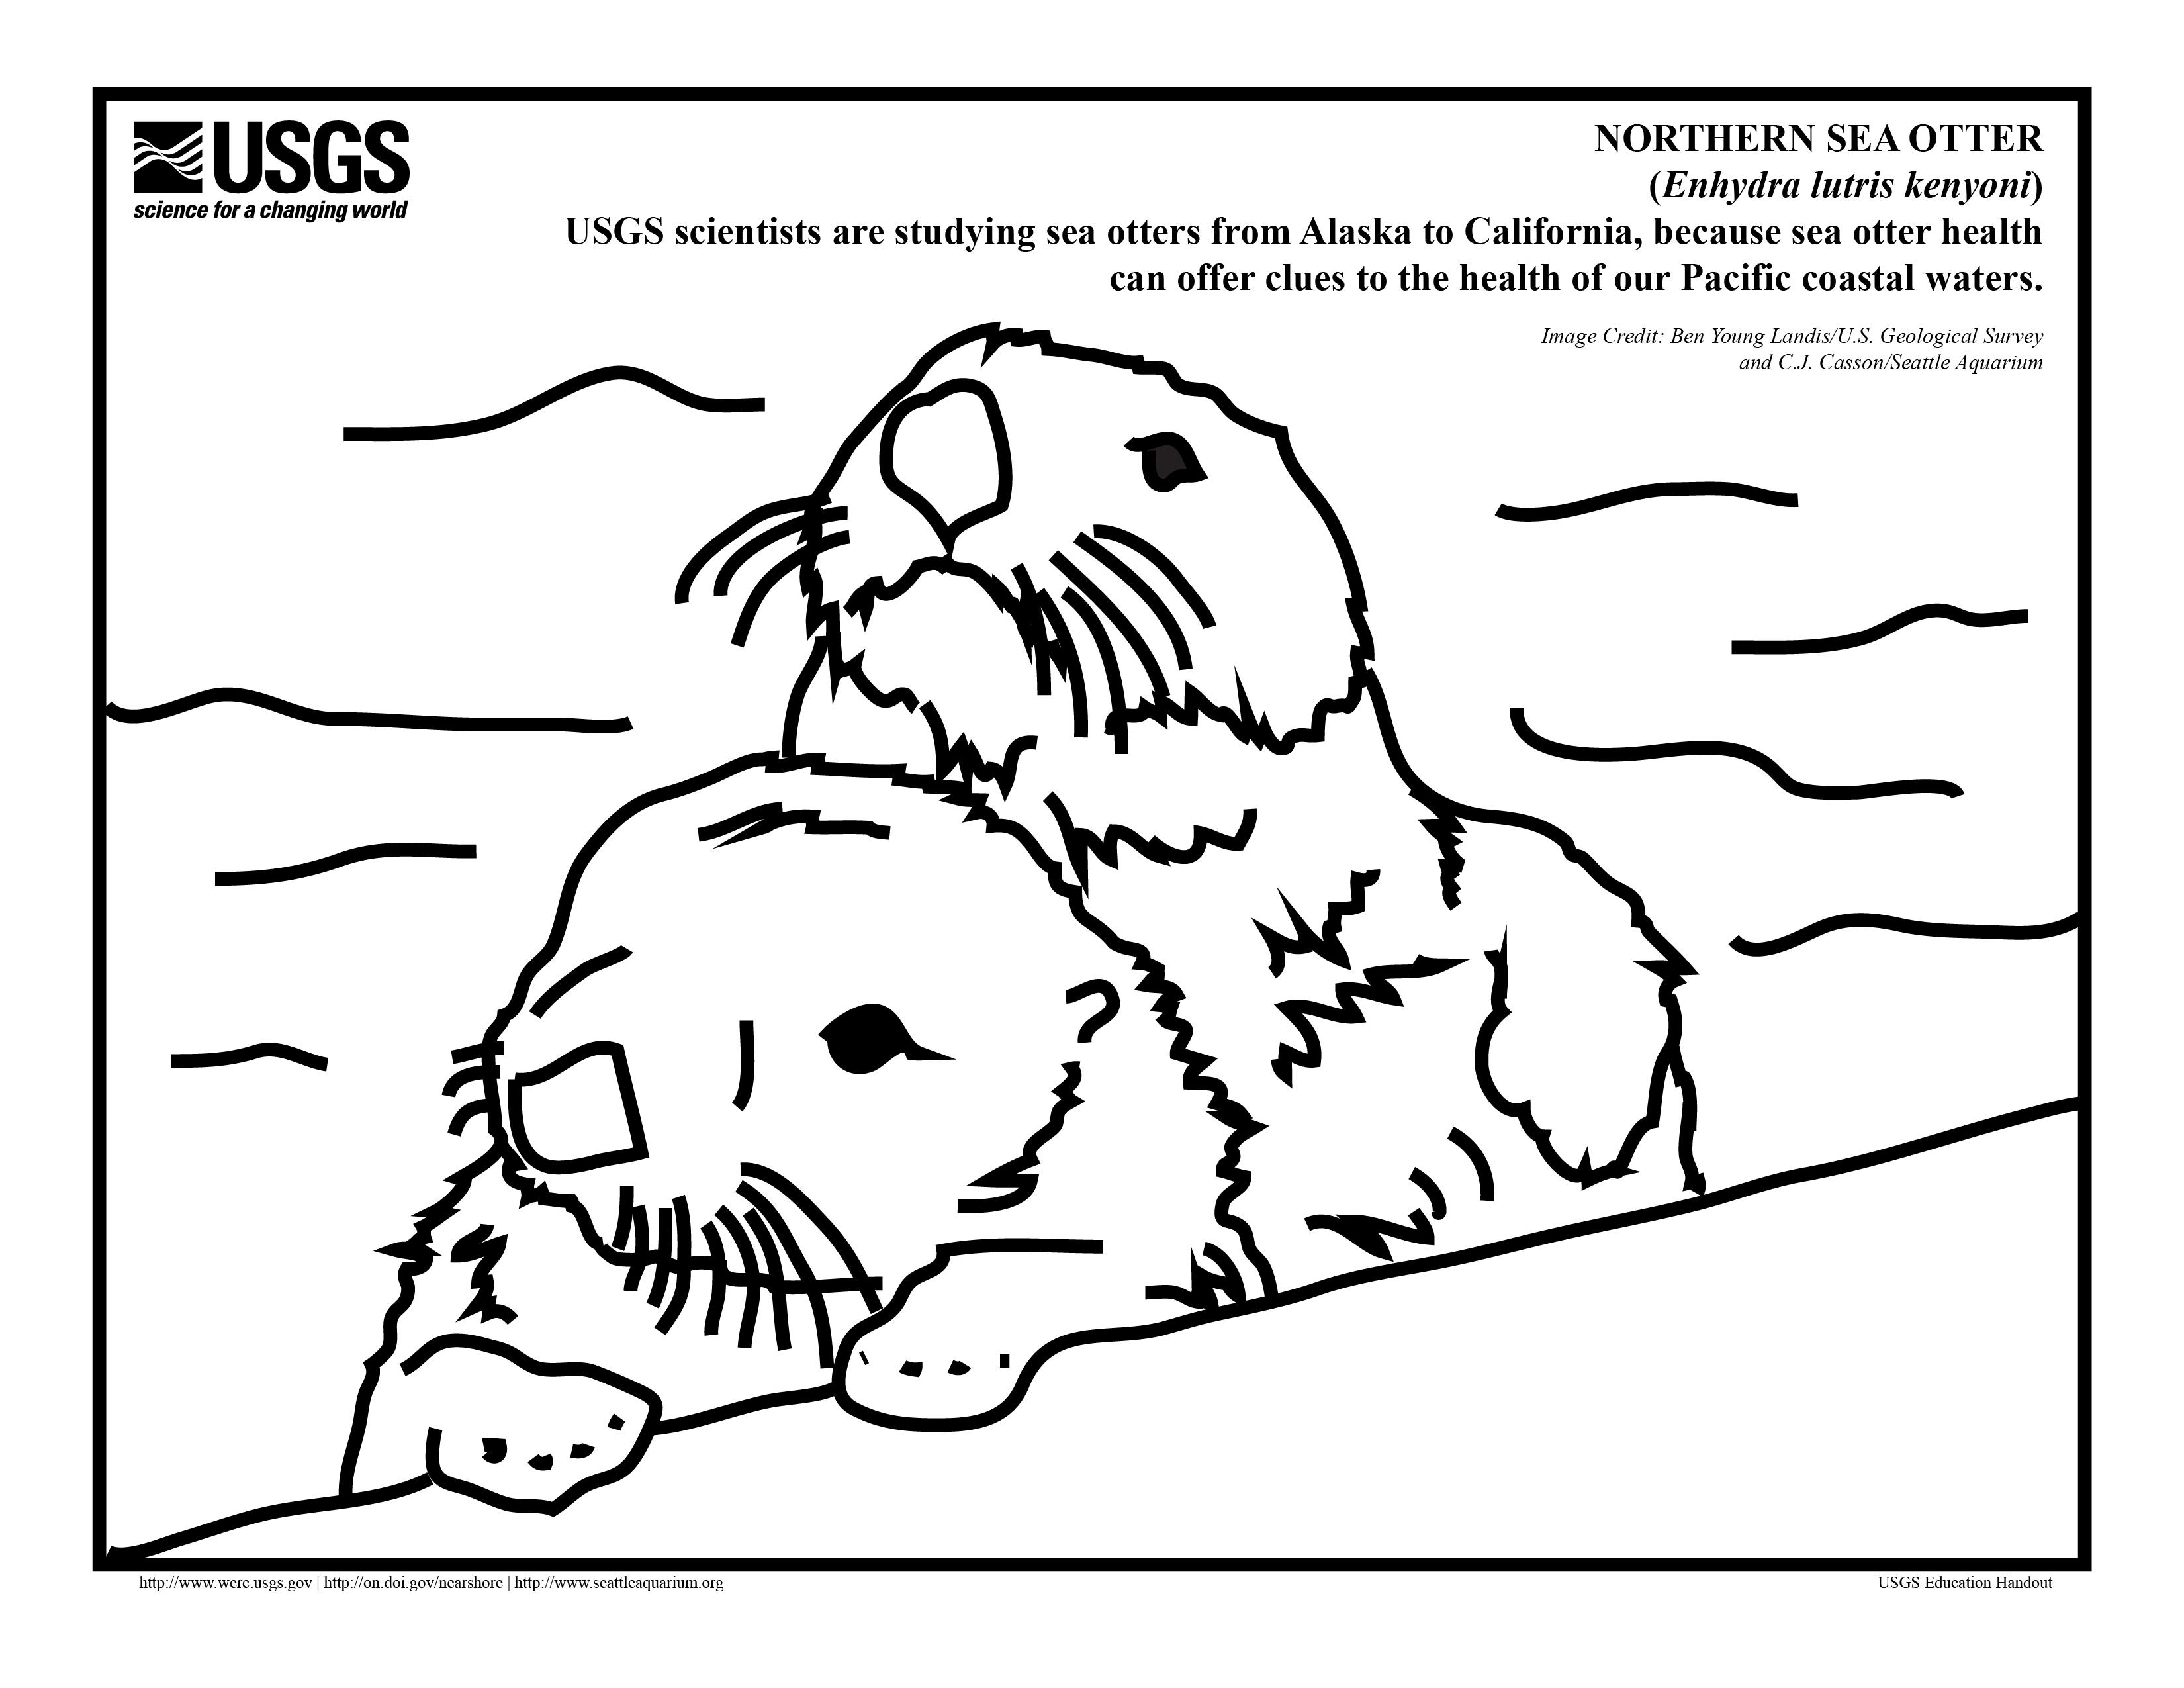 3300x2550 Pleasant Design Otter Coloring Pages Sea Page Pictures Imagixs